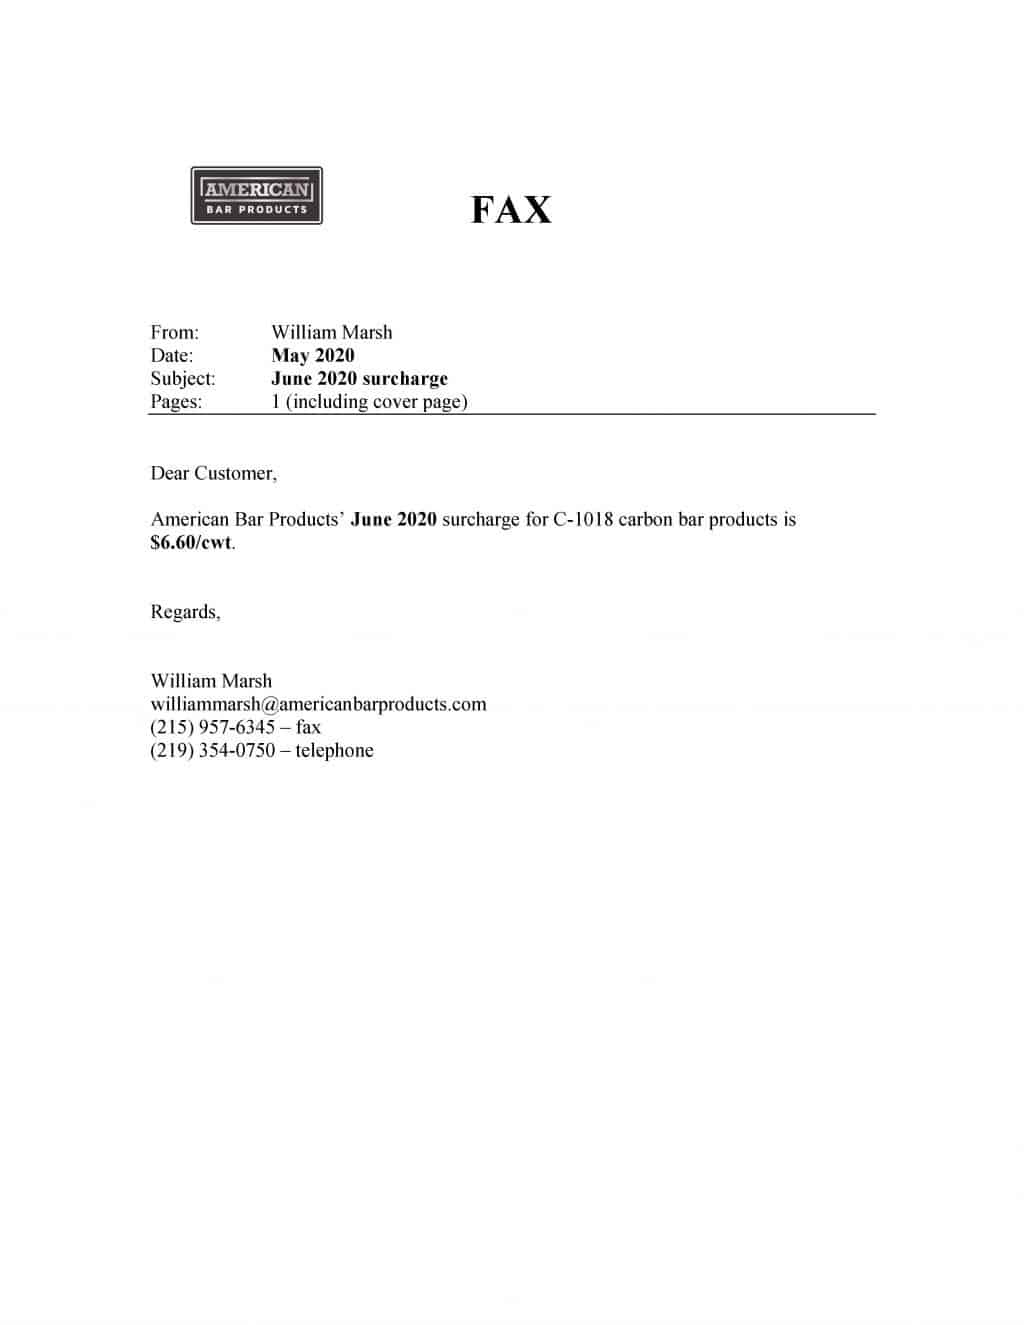 Surcharge Letter, June, 2020